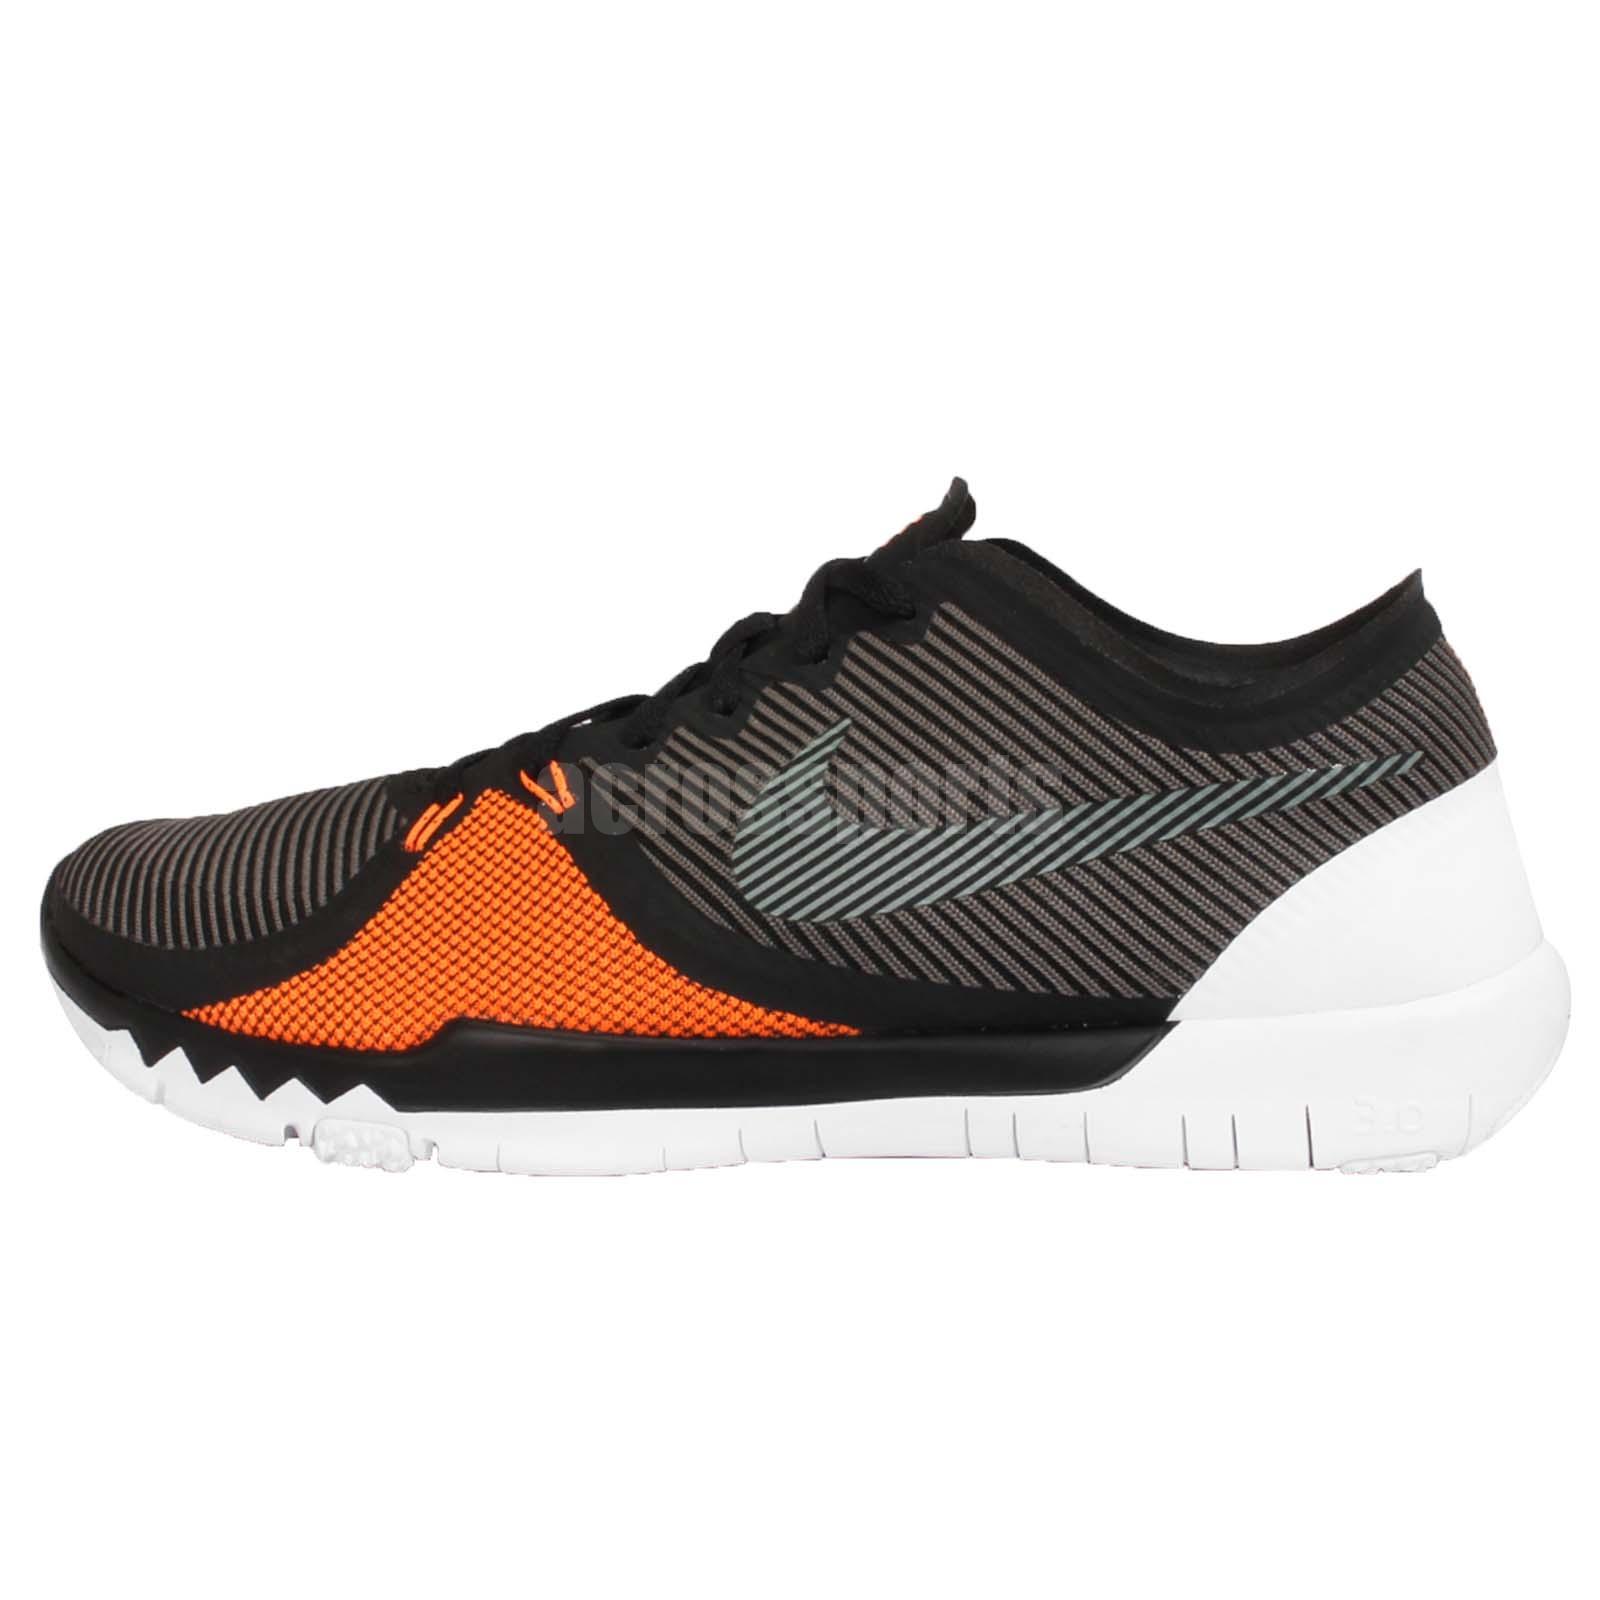 nike free trainer 3 0 v4 mens cross training shoes. Black Bedroom Furniture Sets. Home Design Ideas